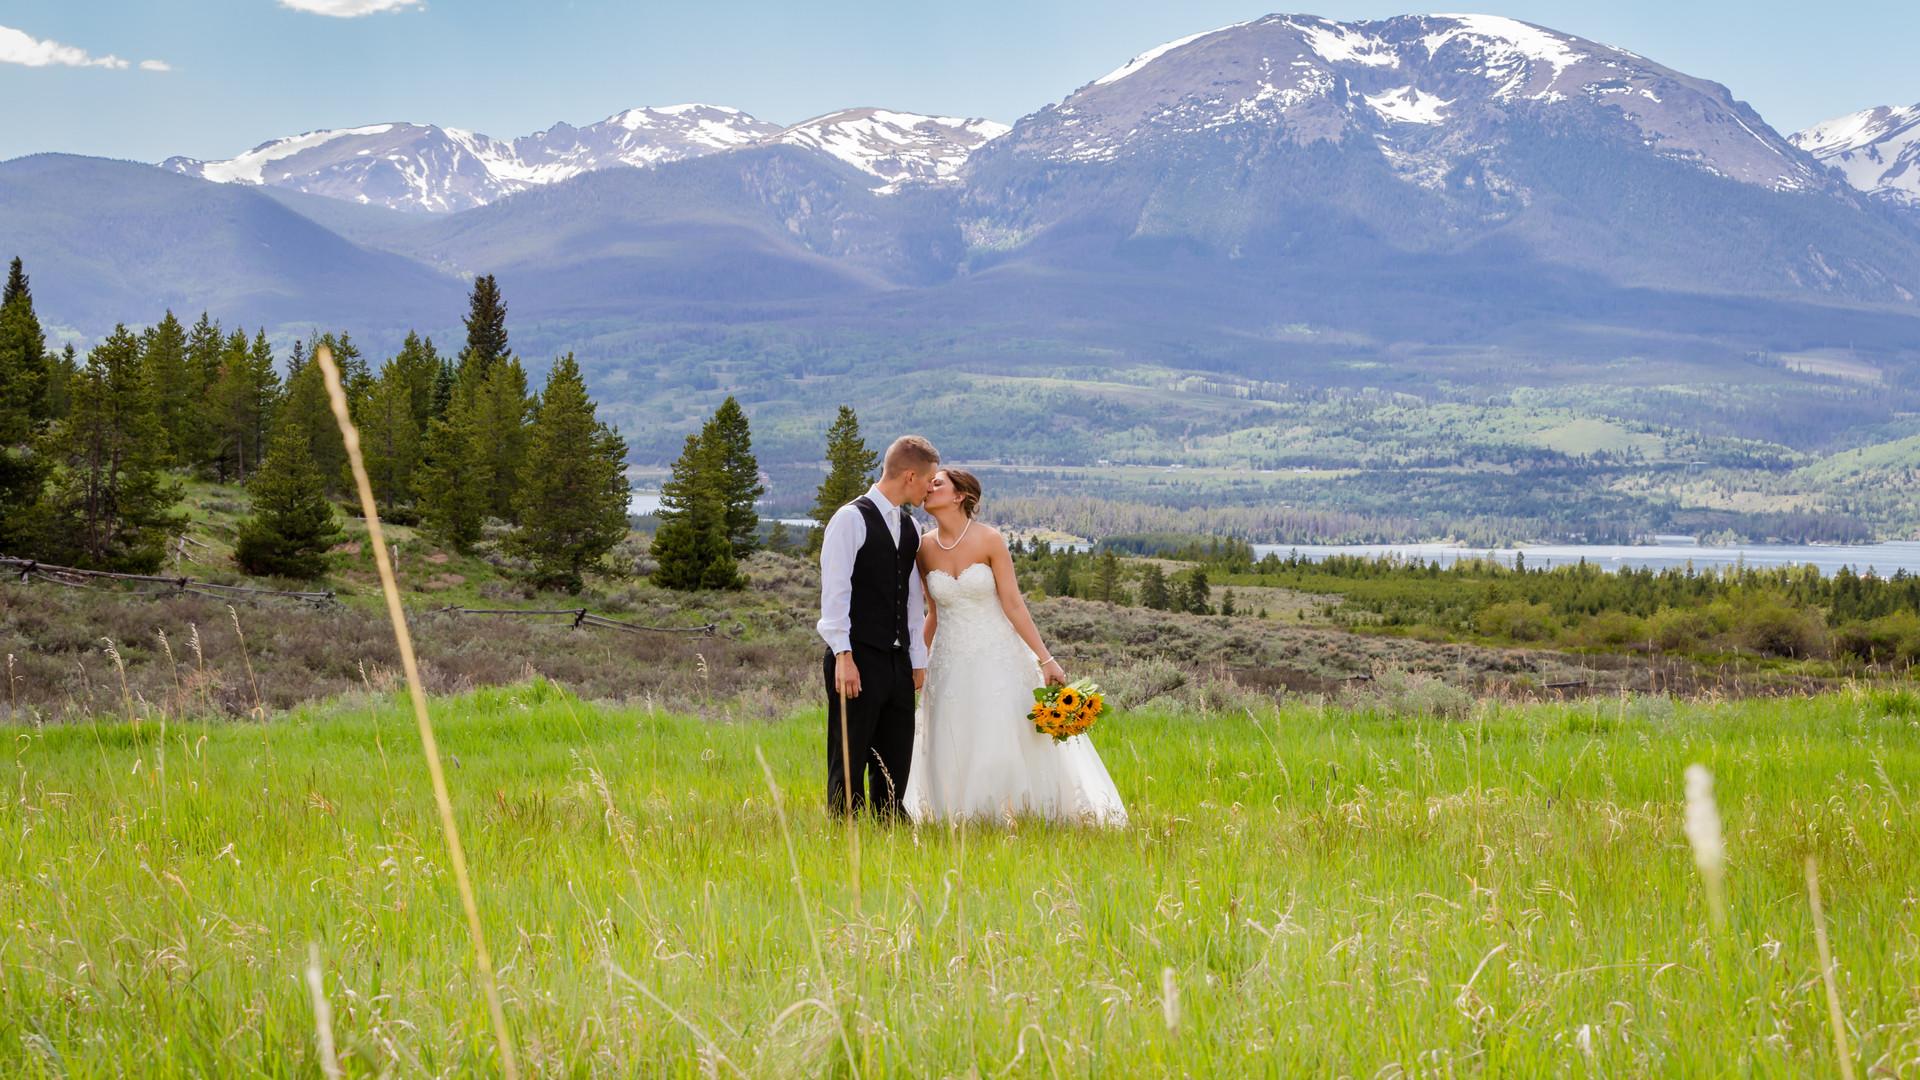 LAB Photography Denver - 2020-9.jpg